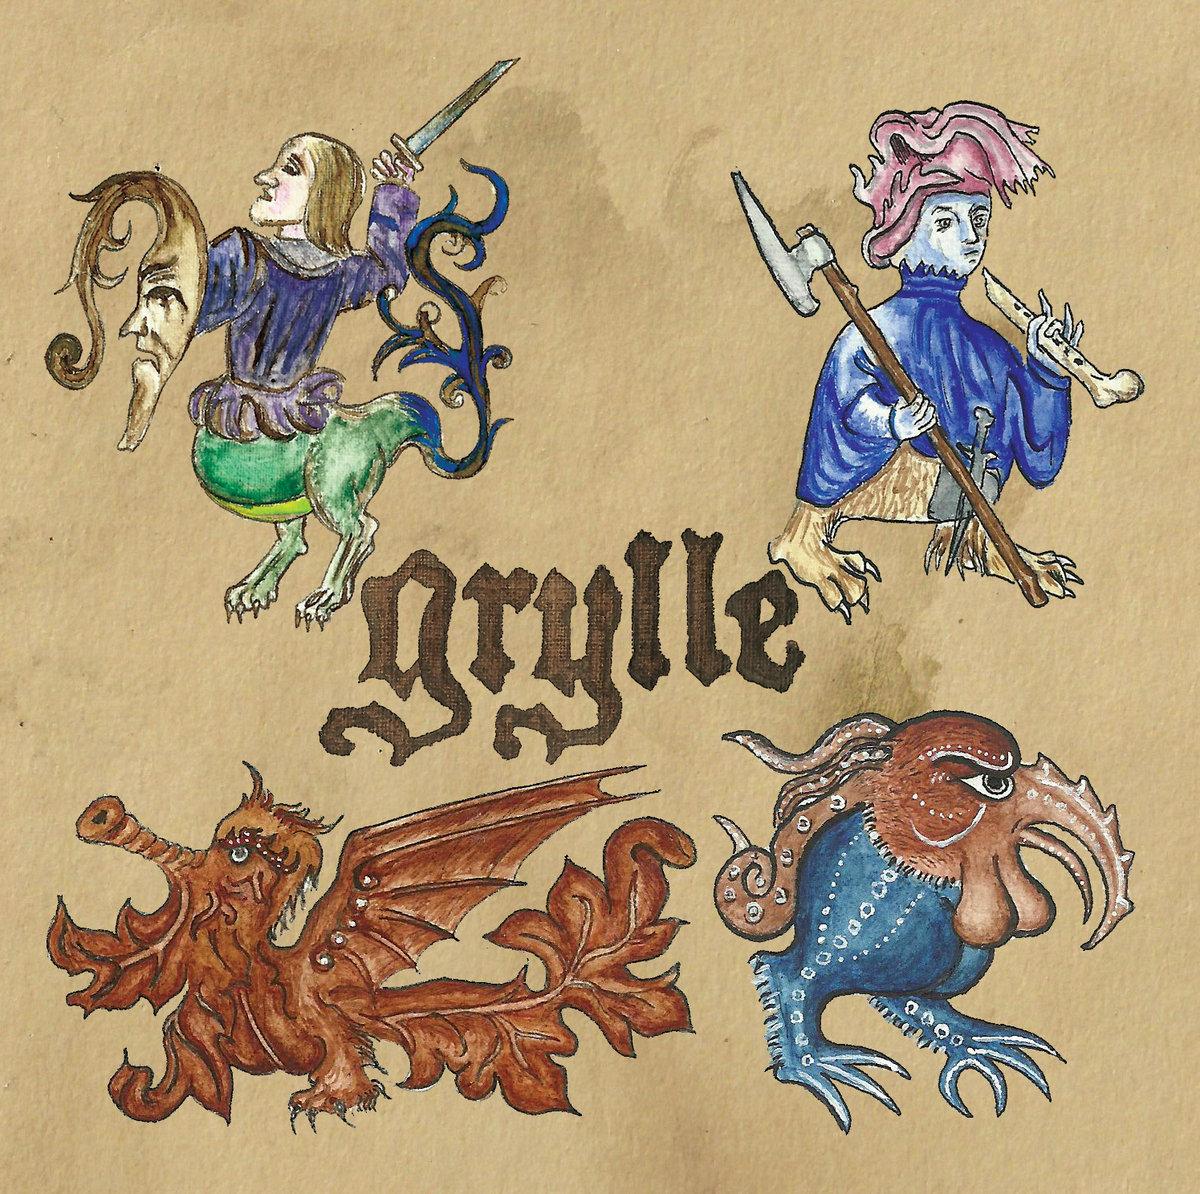 grylle mondes vermeils black metal medieval hyvermor interview le scribe du rock